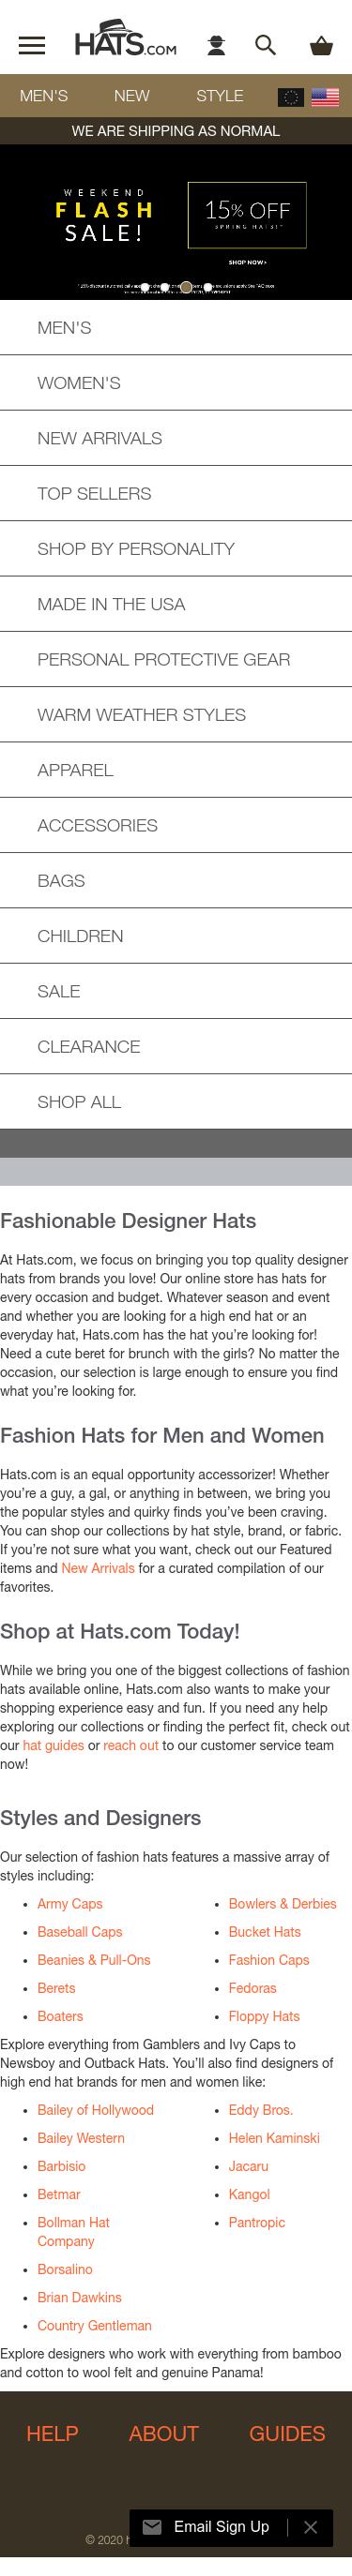 Hats.com Coupon